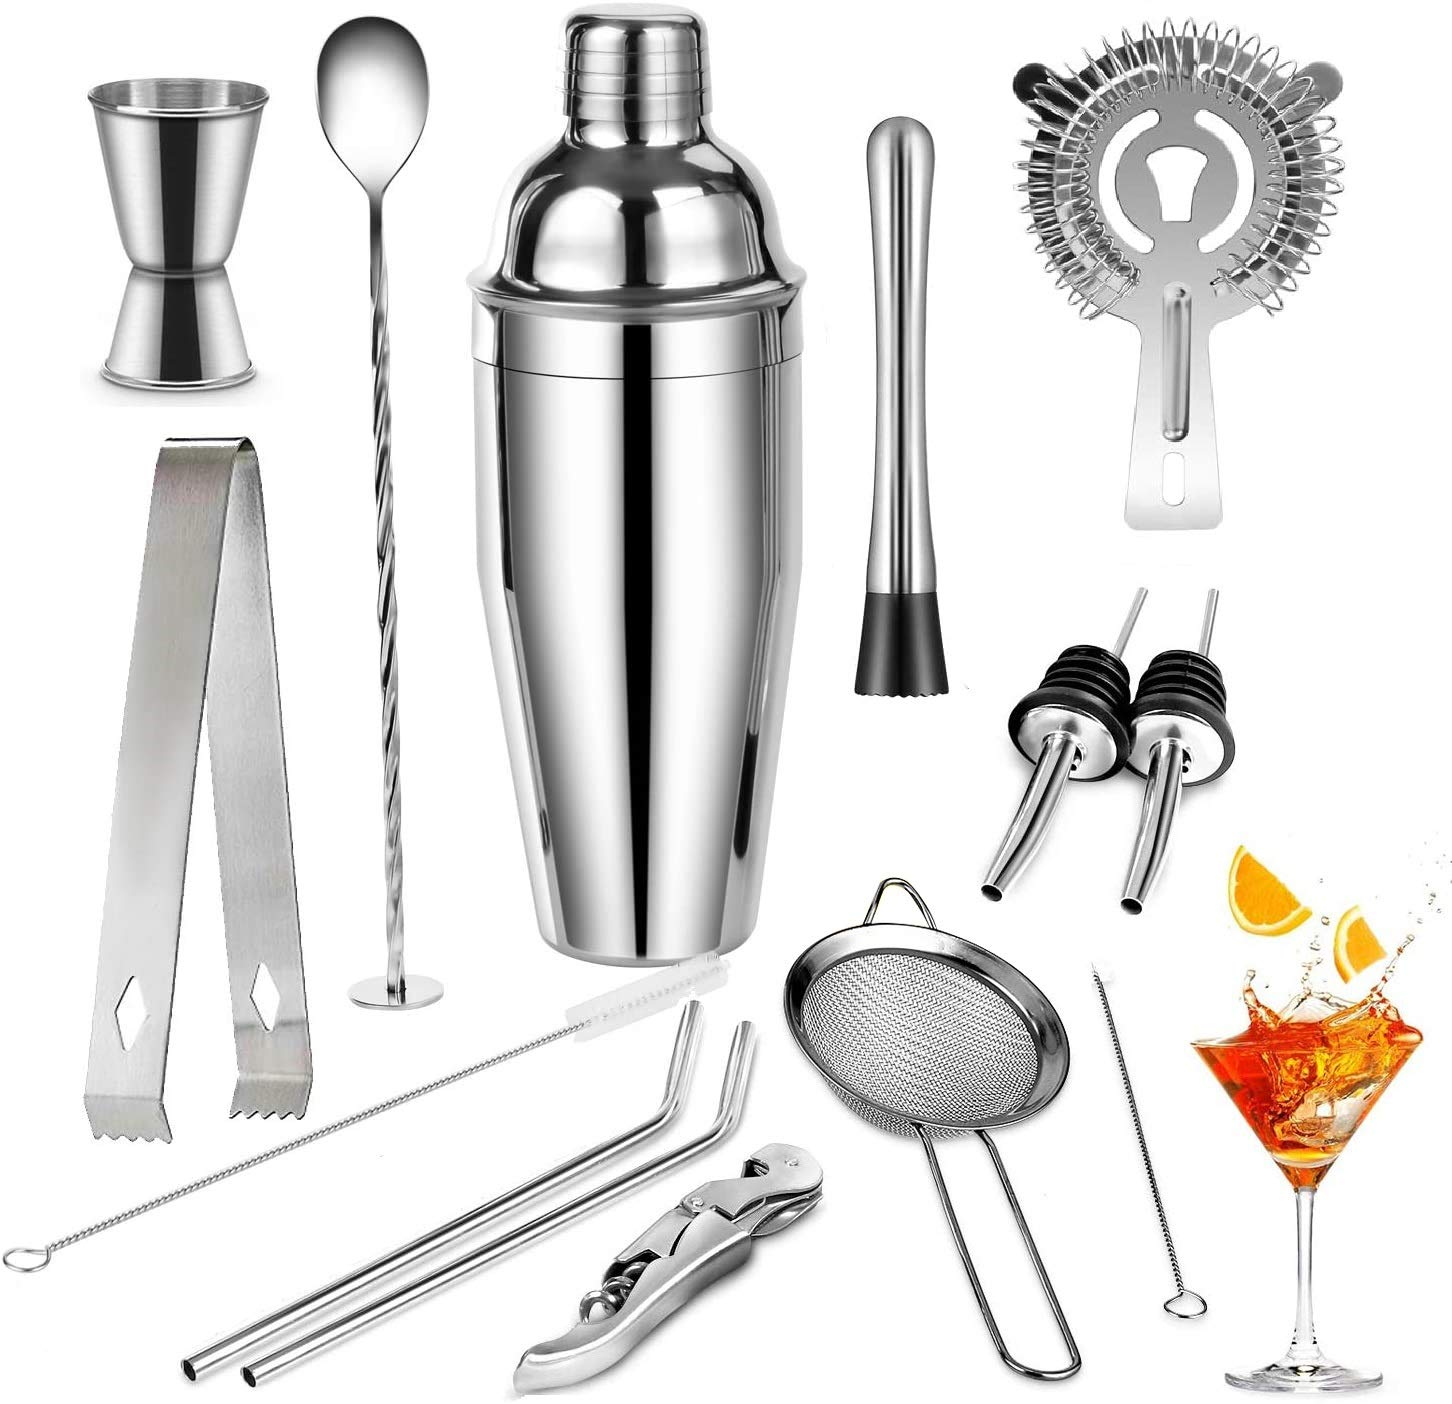 Cocktail Set,Cocktail Making Set 13Pcs, Cocktail Shaker Set,Bartending Kit Stainless Steel Cocktail Bar Tools,Large Drink Mixer Kits,Perfect Home Bartending Kit(750ML)